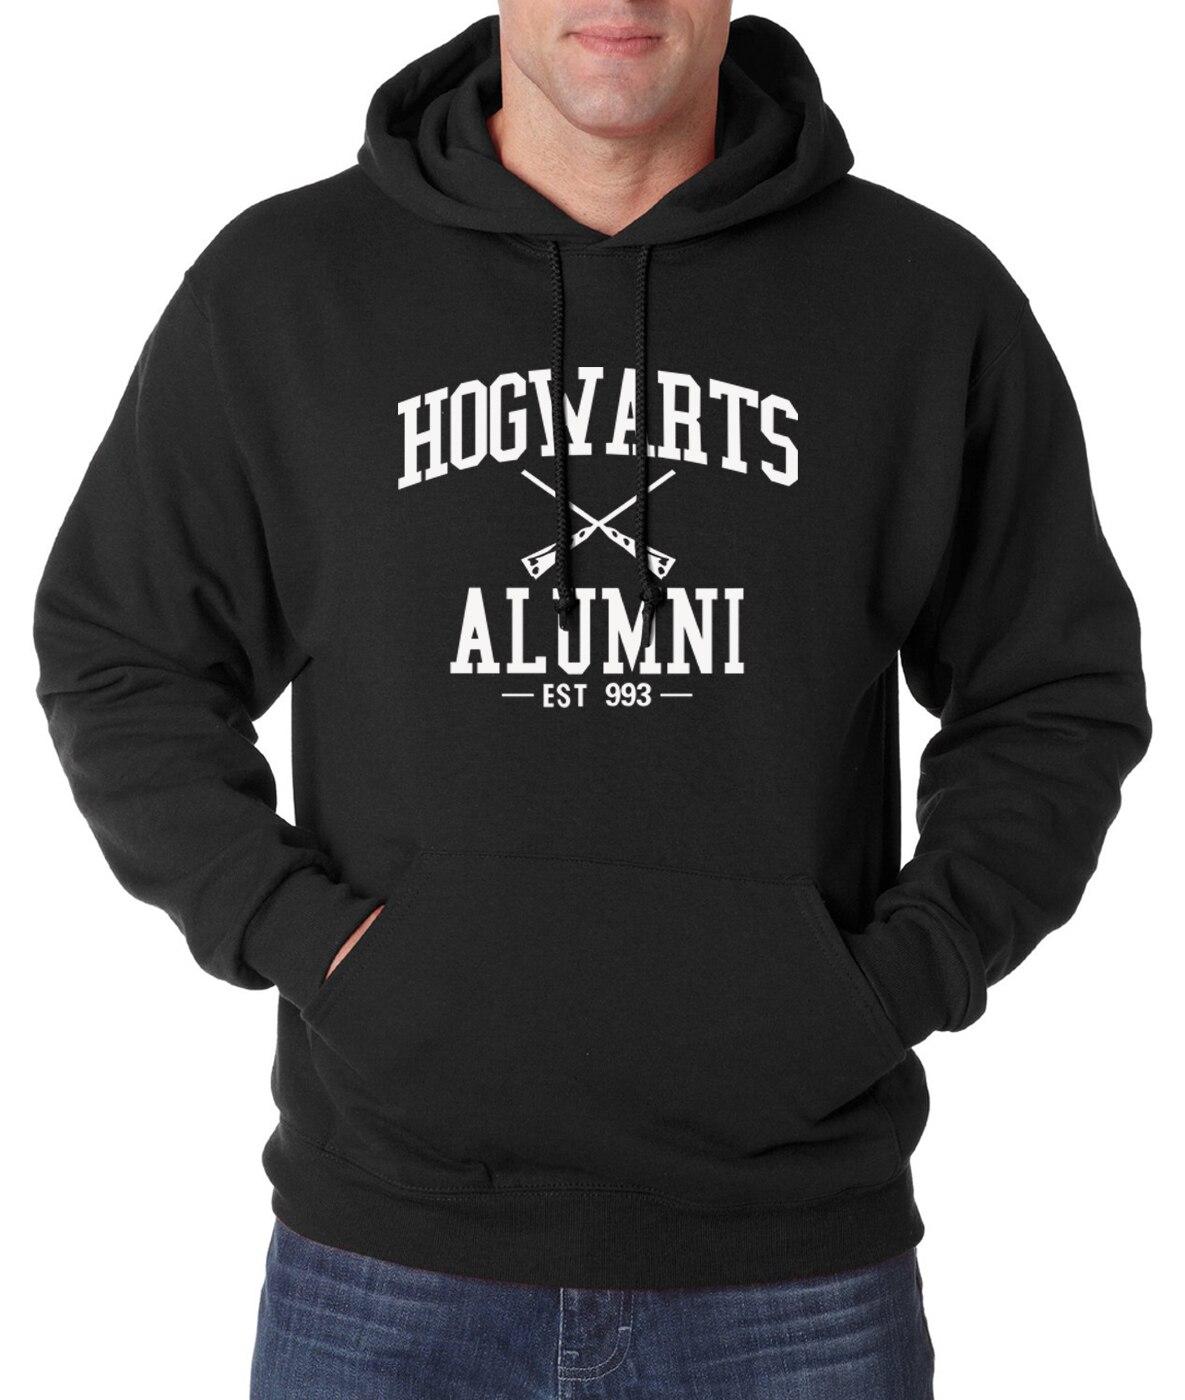 Hogwarts Hoodies men Inspired Magic Print 2017 hot sale spring winter men sweatshirt warm fleece high quality hoodie movie fans